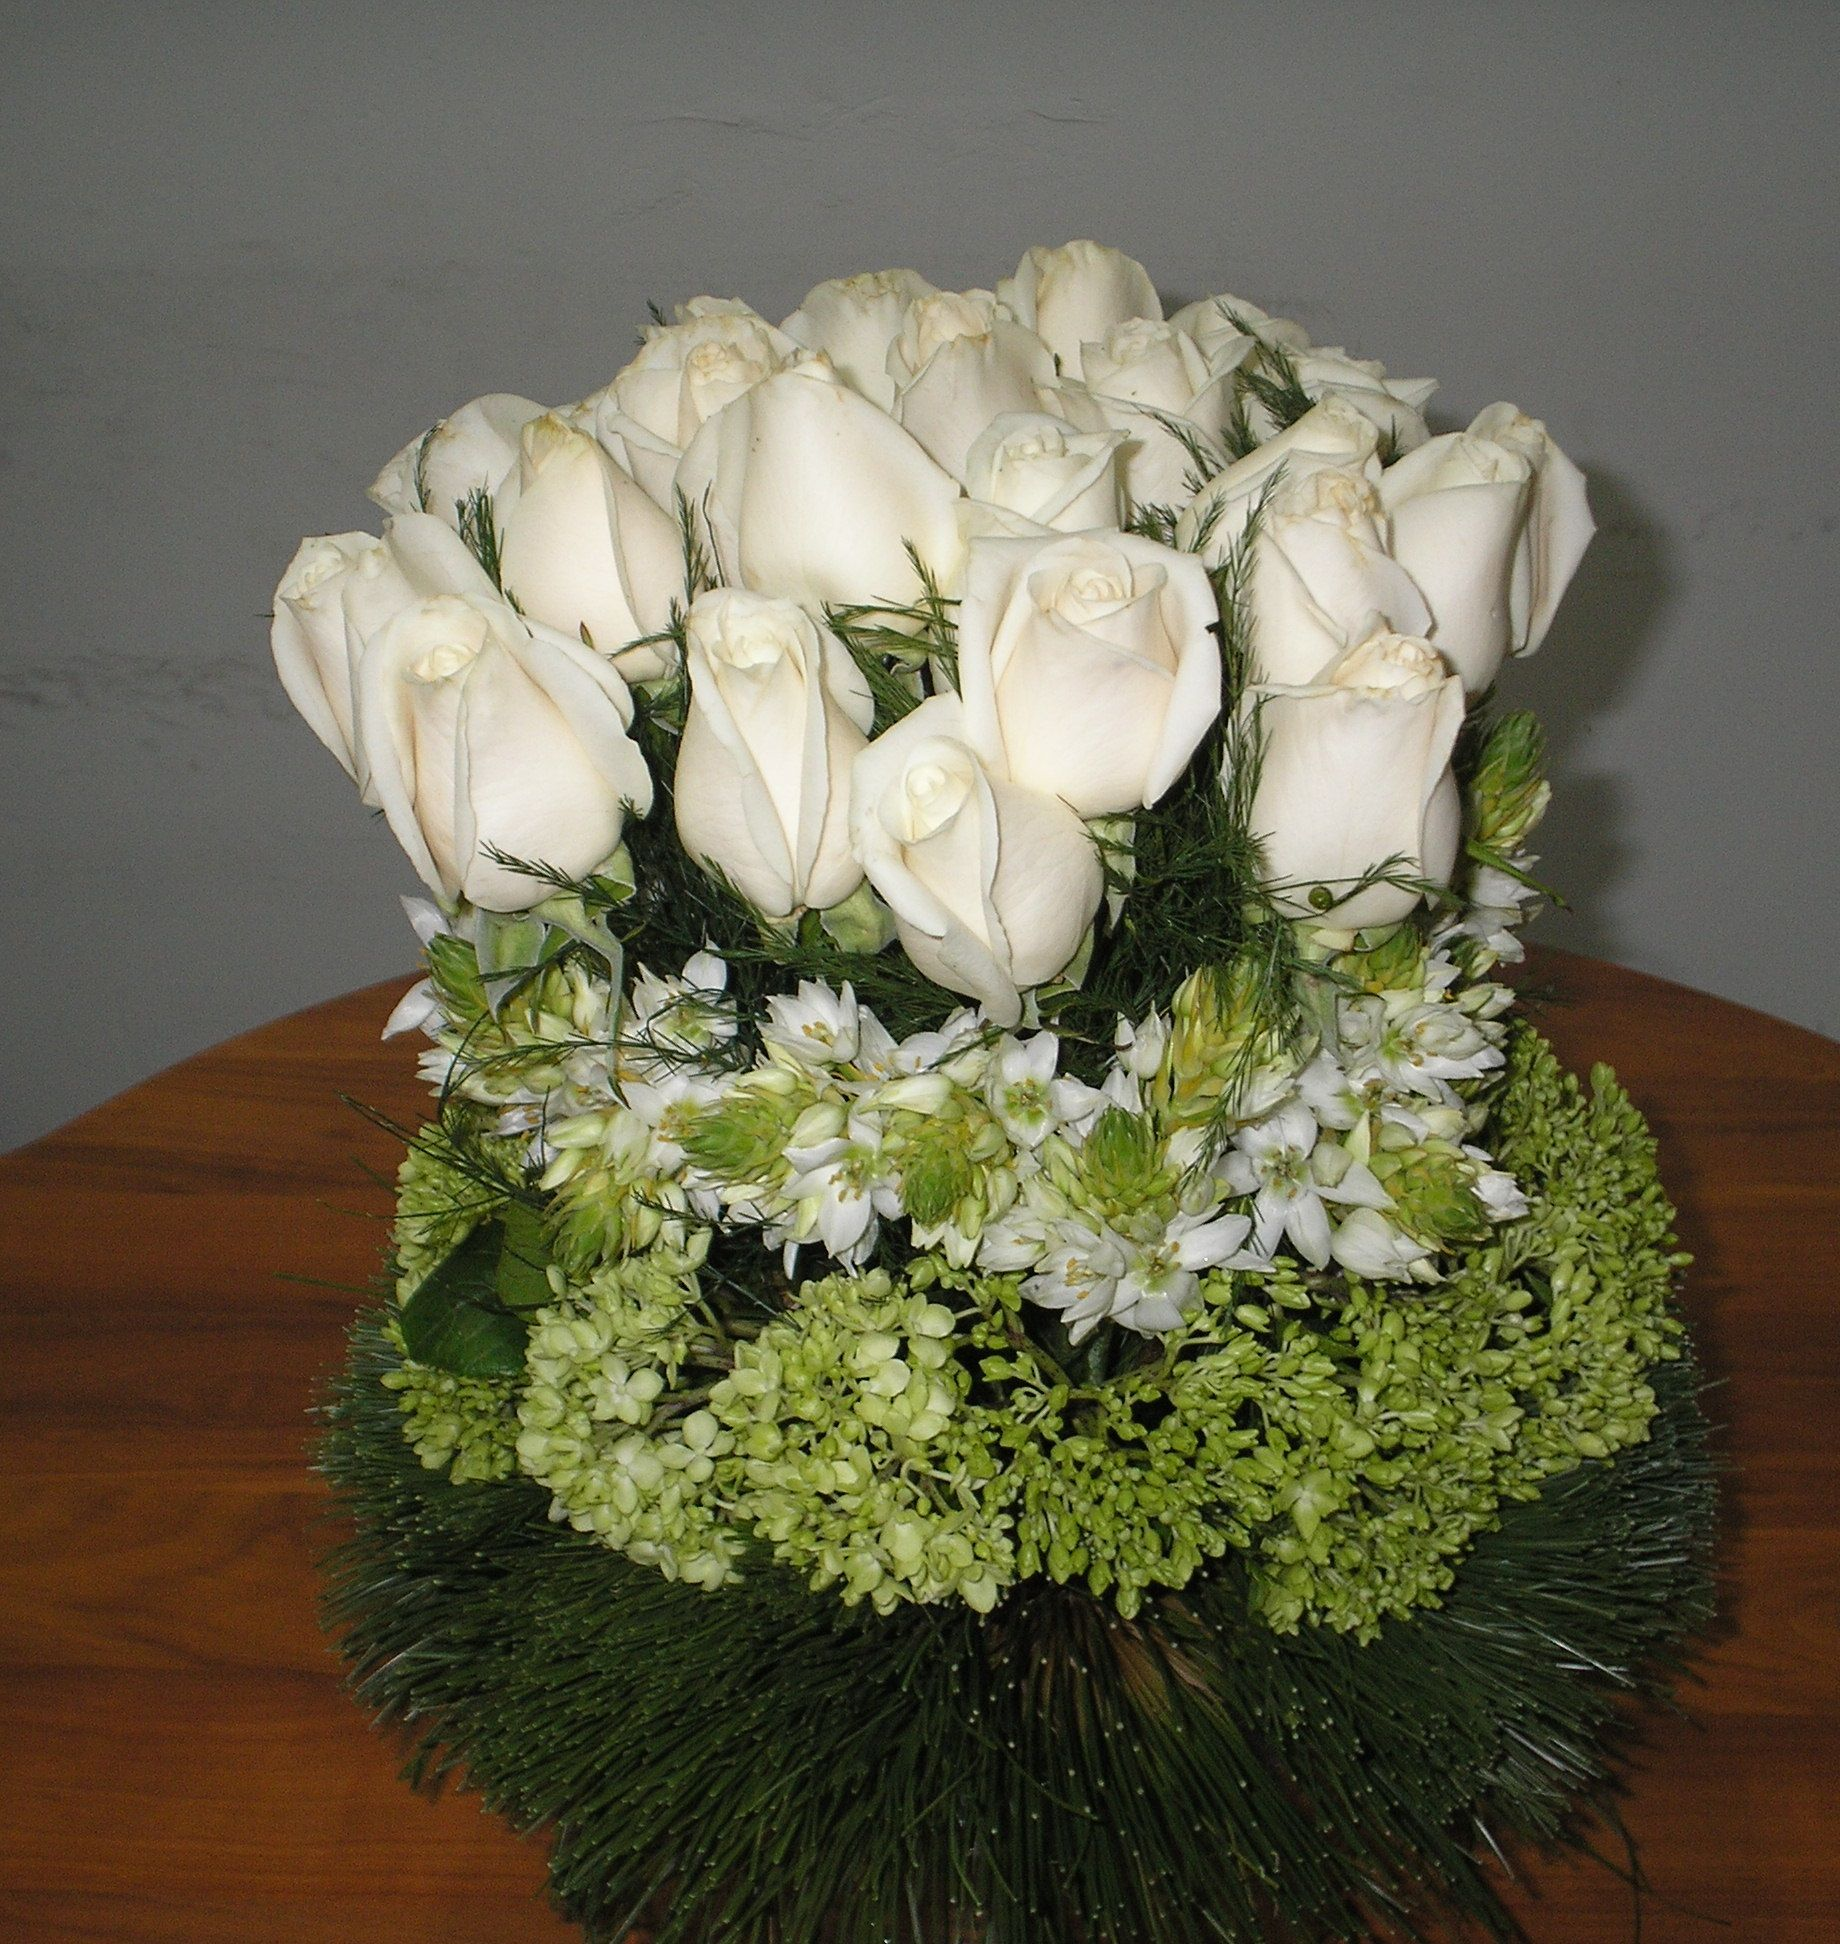 Centro De Mesas En Rosas Estrellas De Belen Hortencias Y  ~ Bolas Para Decorar Centros De Mesa